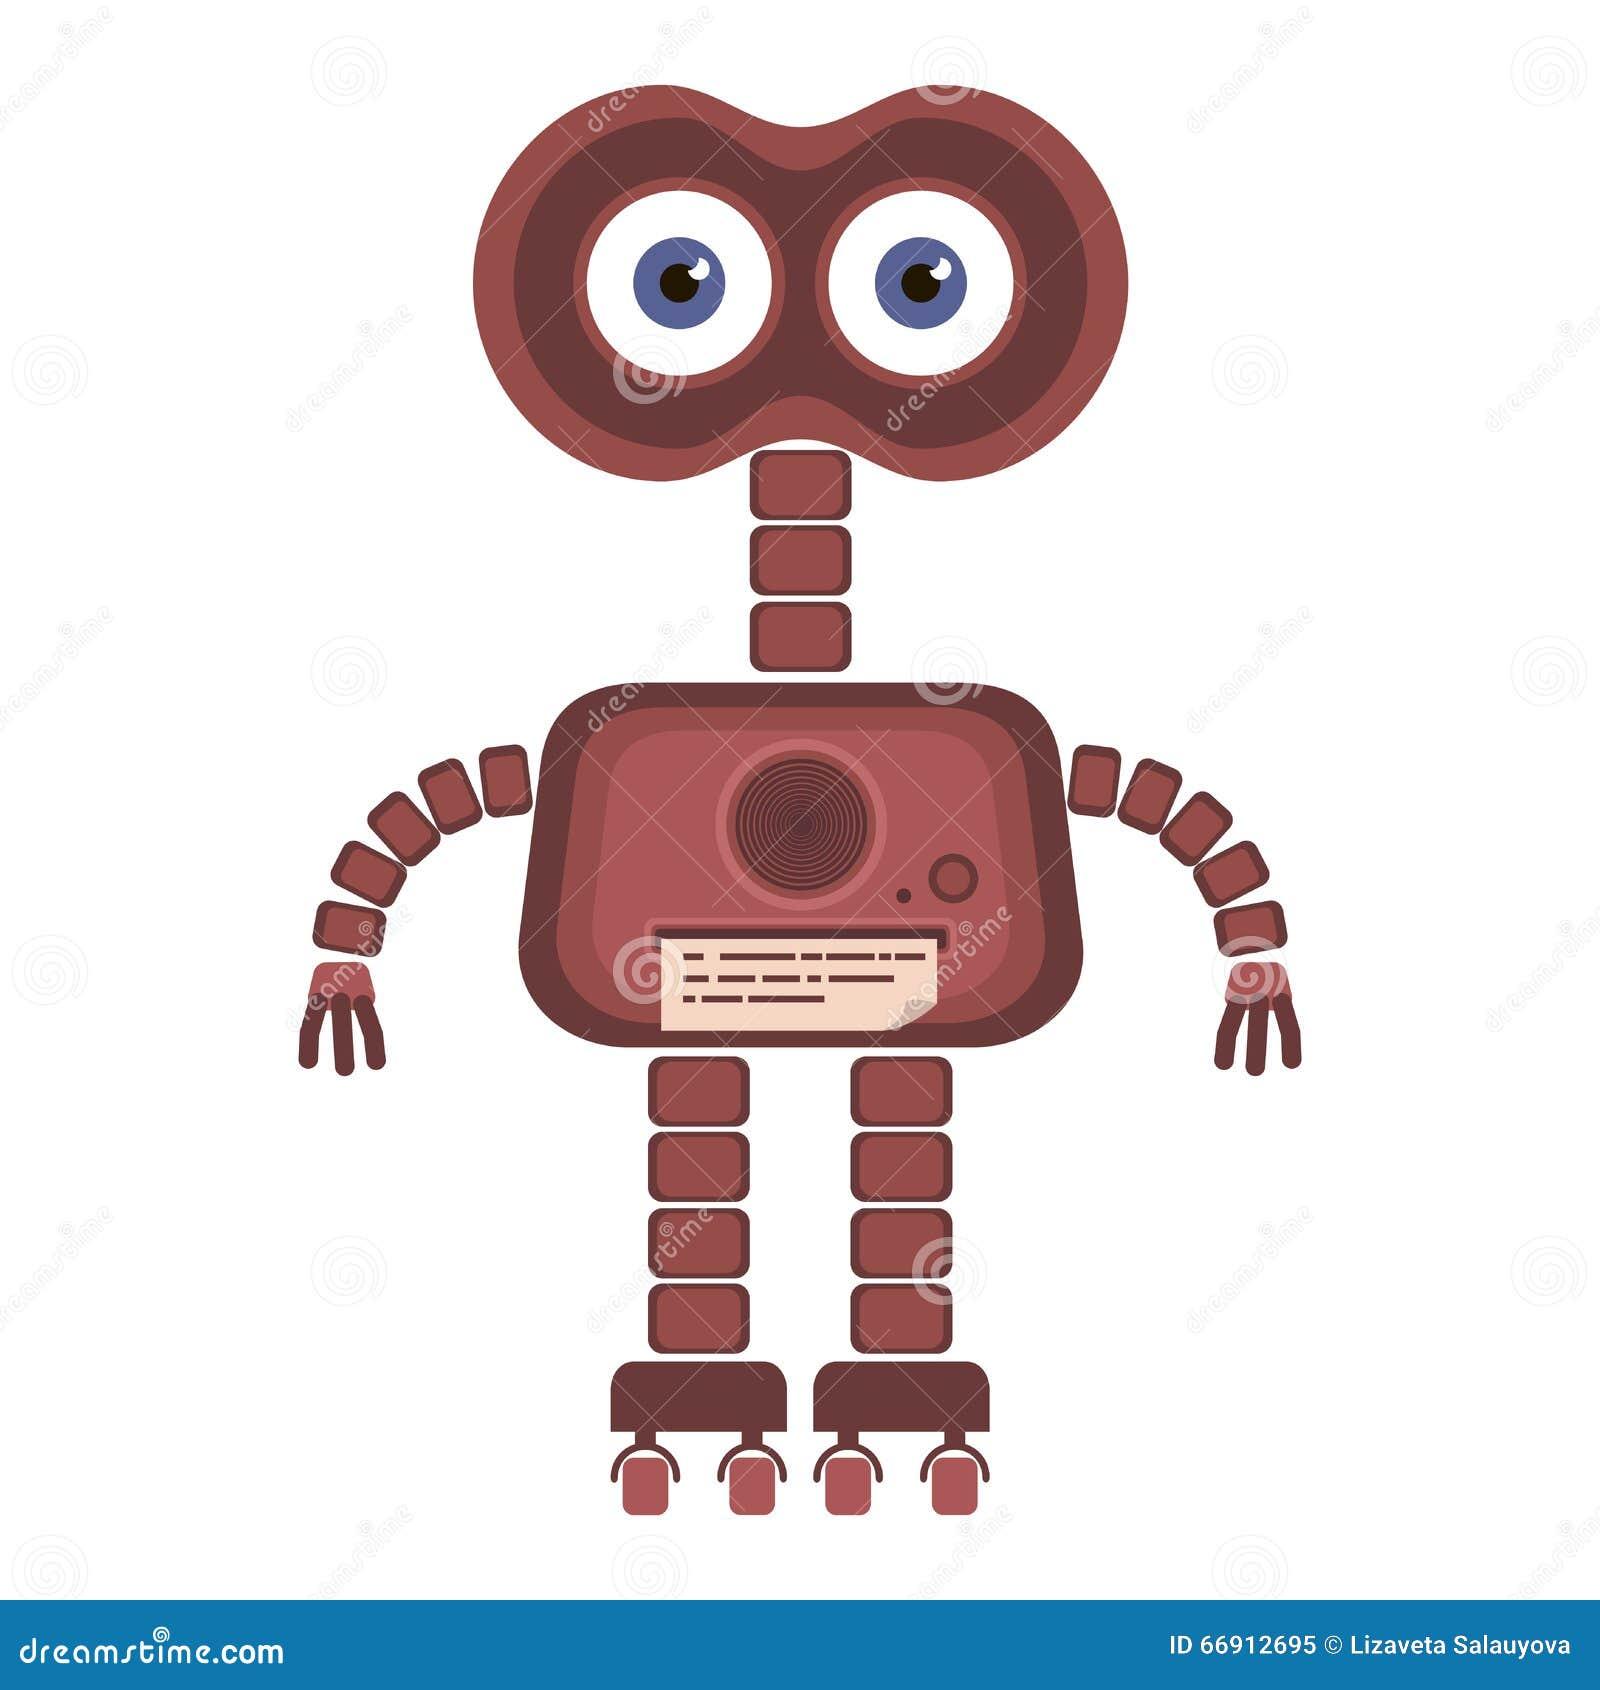 Cartoon Robot Toy : Cartoon cute robot stock vector illustration of element